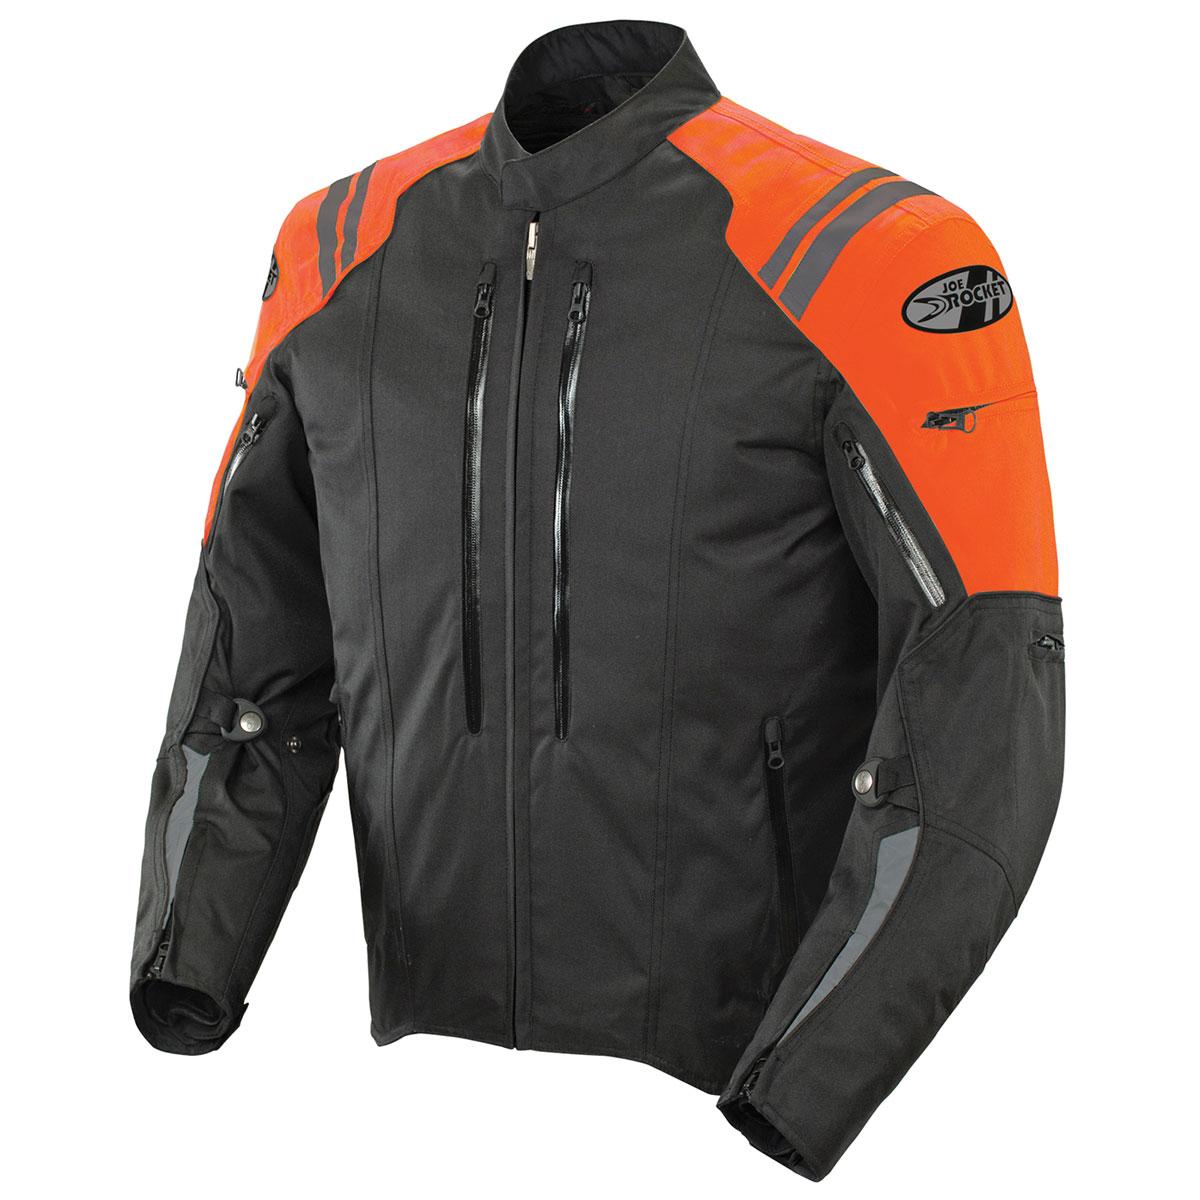 Joe Rocket Men's Atomic 4.0 Waterproof Orange/Black Jacket